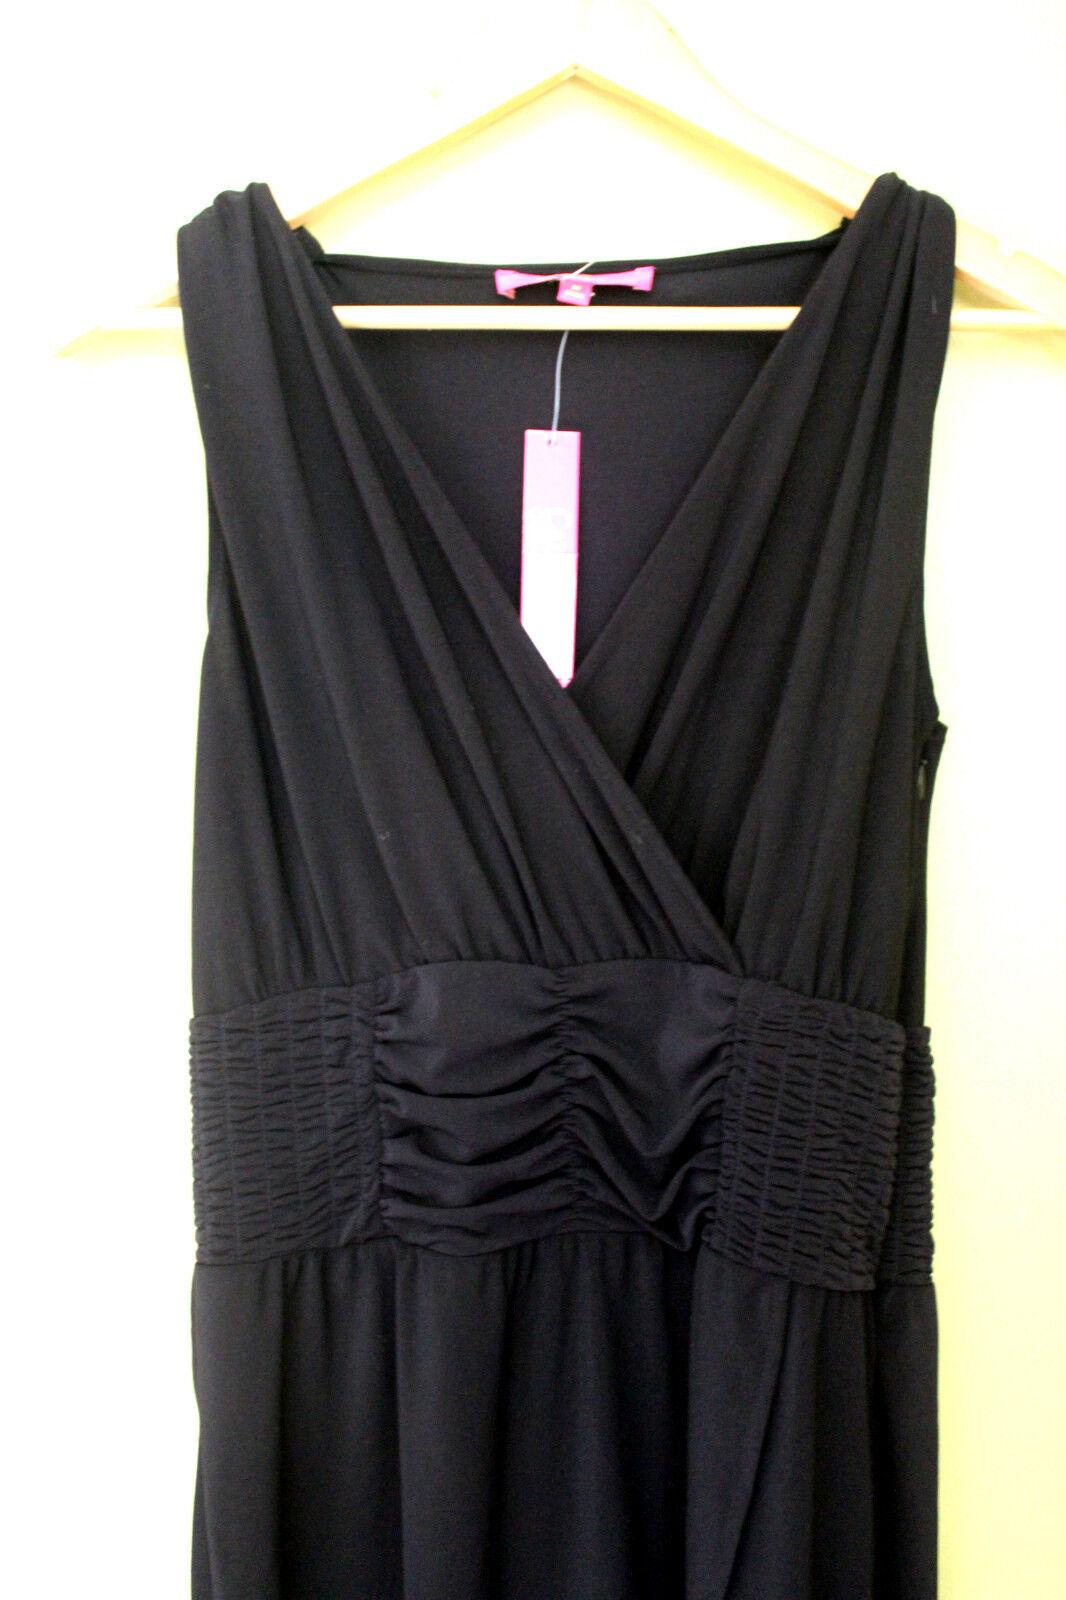 NWT Catherine Malandrino Sexy schwarz Raine V-Neck Smocked Knit Dress M